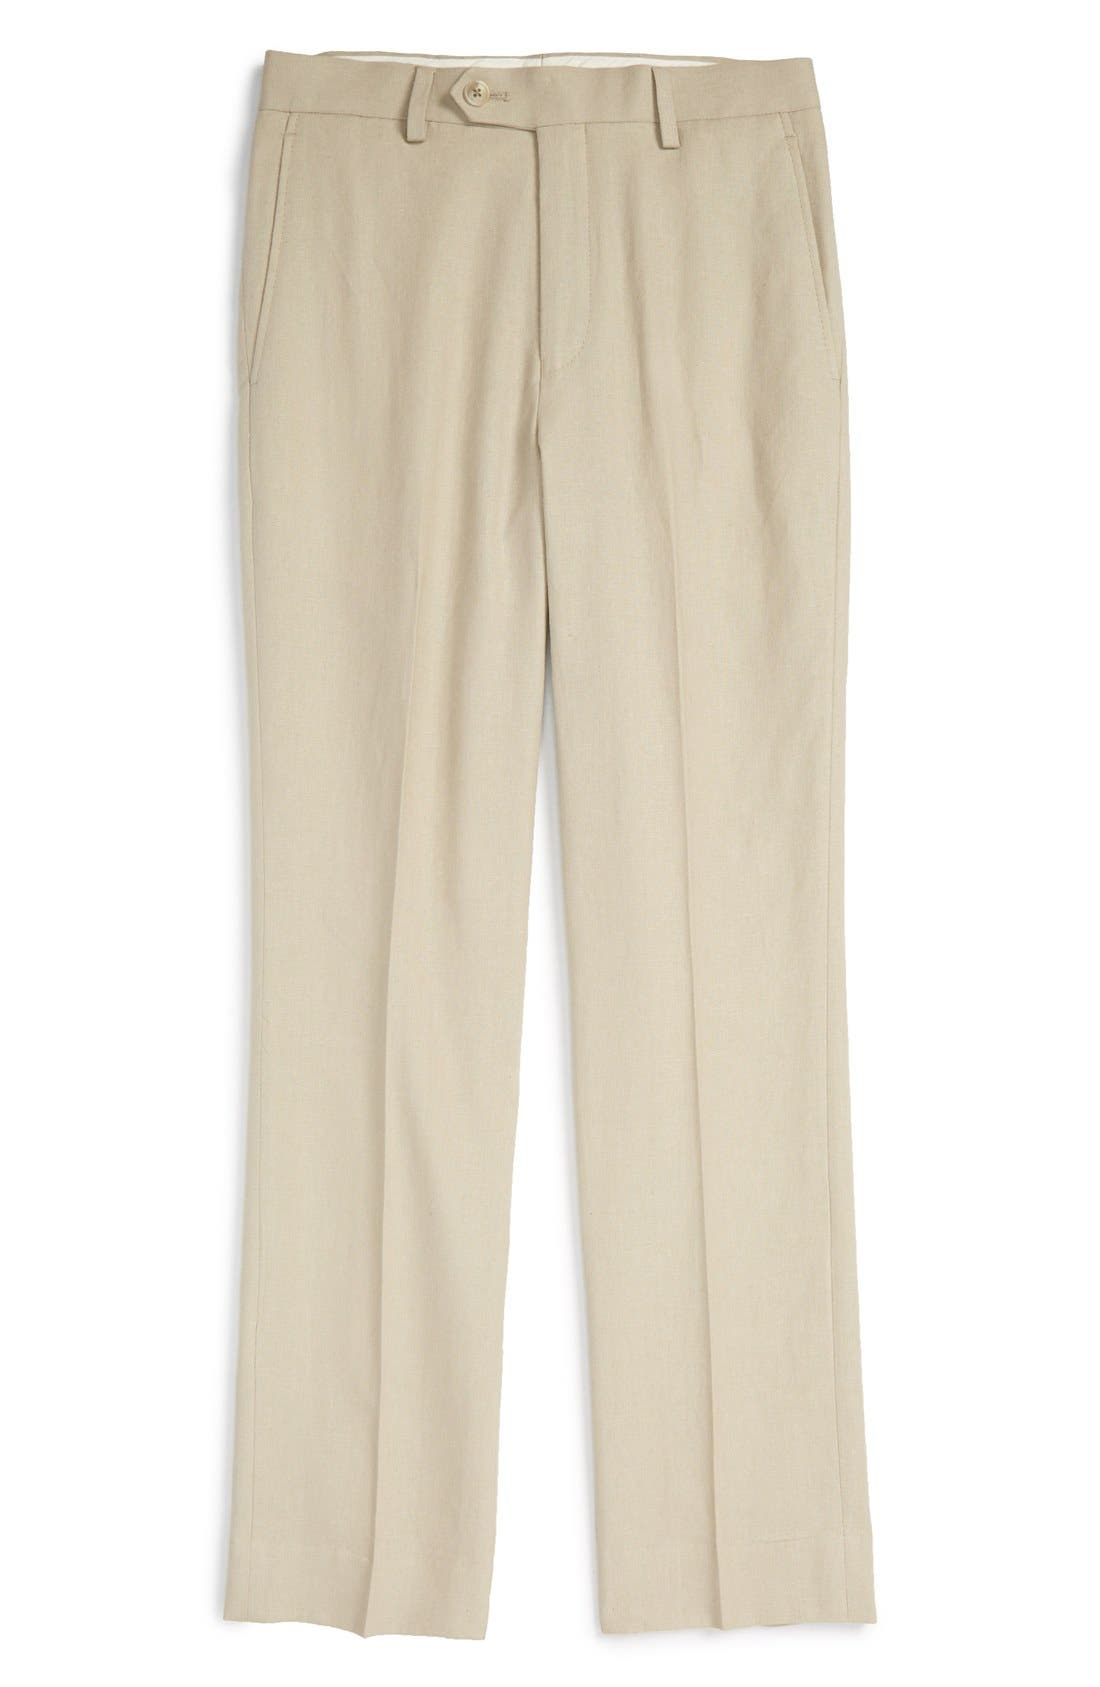 Boys Michael Kors Kirton Flat Front Linen Blend Trousers Size 16  Beige